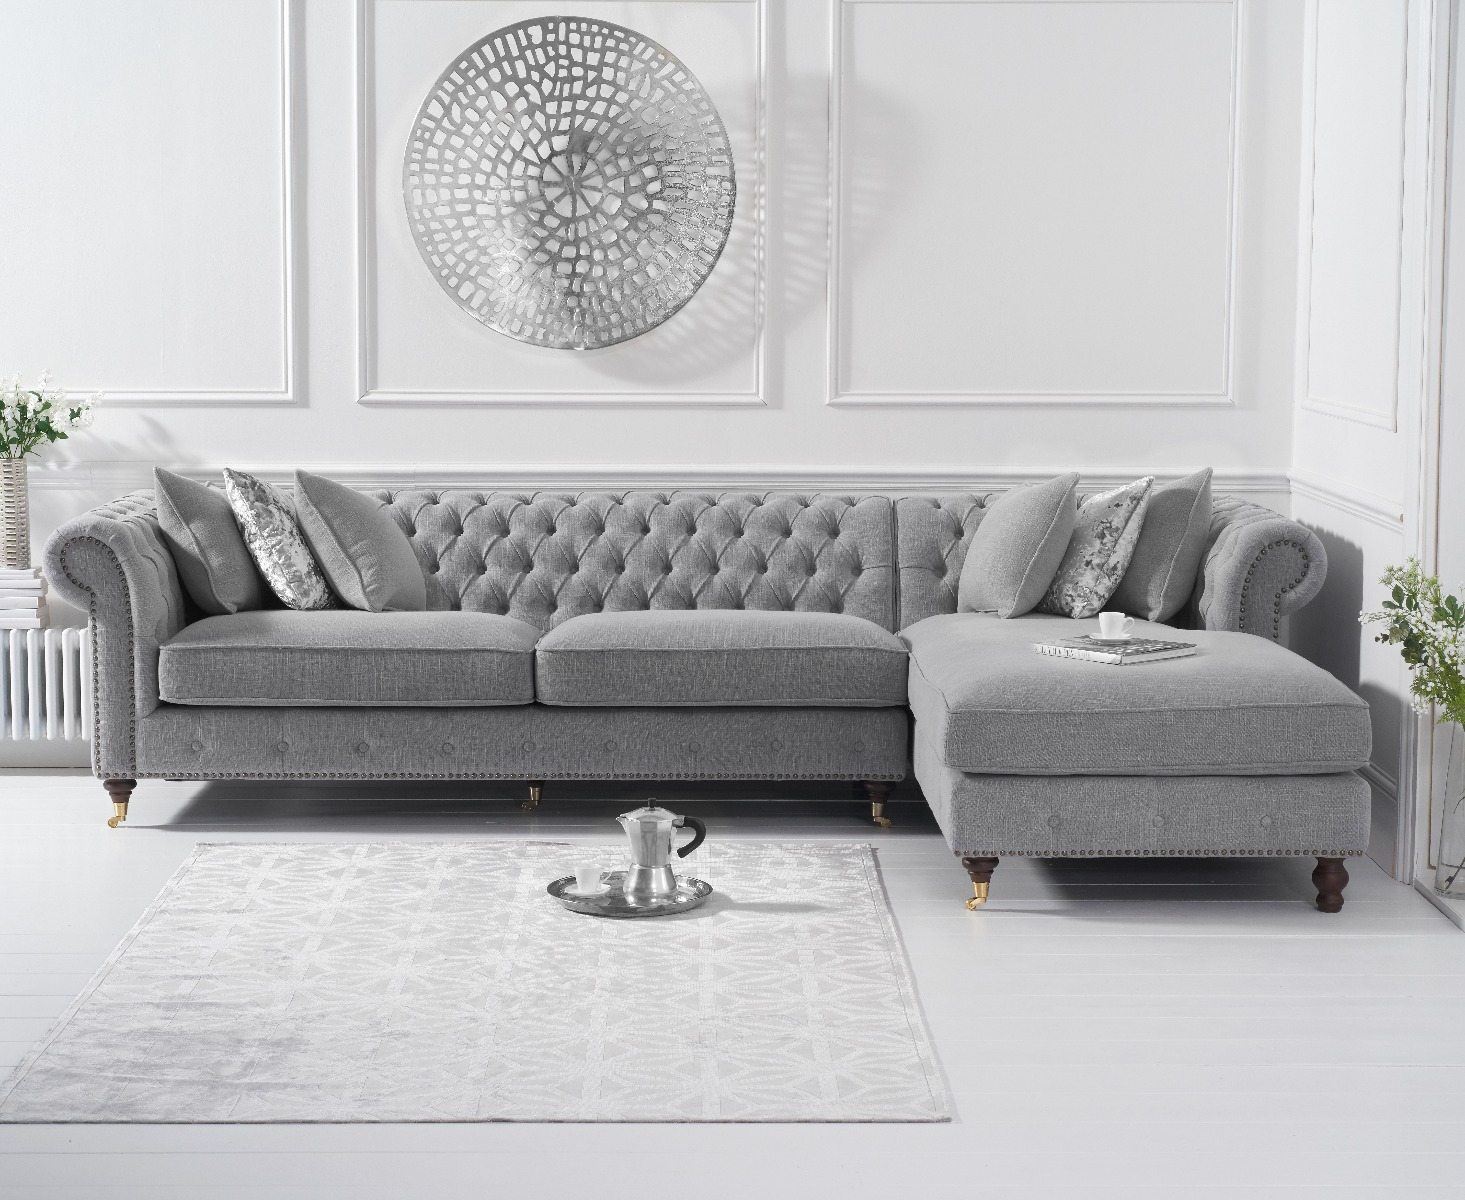 Groovy Flora Grey Linen Right Facing Chesterfield Chaise Sofa Inzonedesignstudio Interior Chair Design Inzonedesignstudiocom